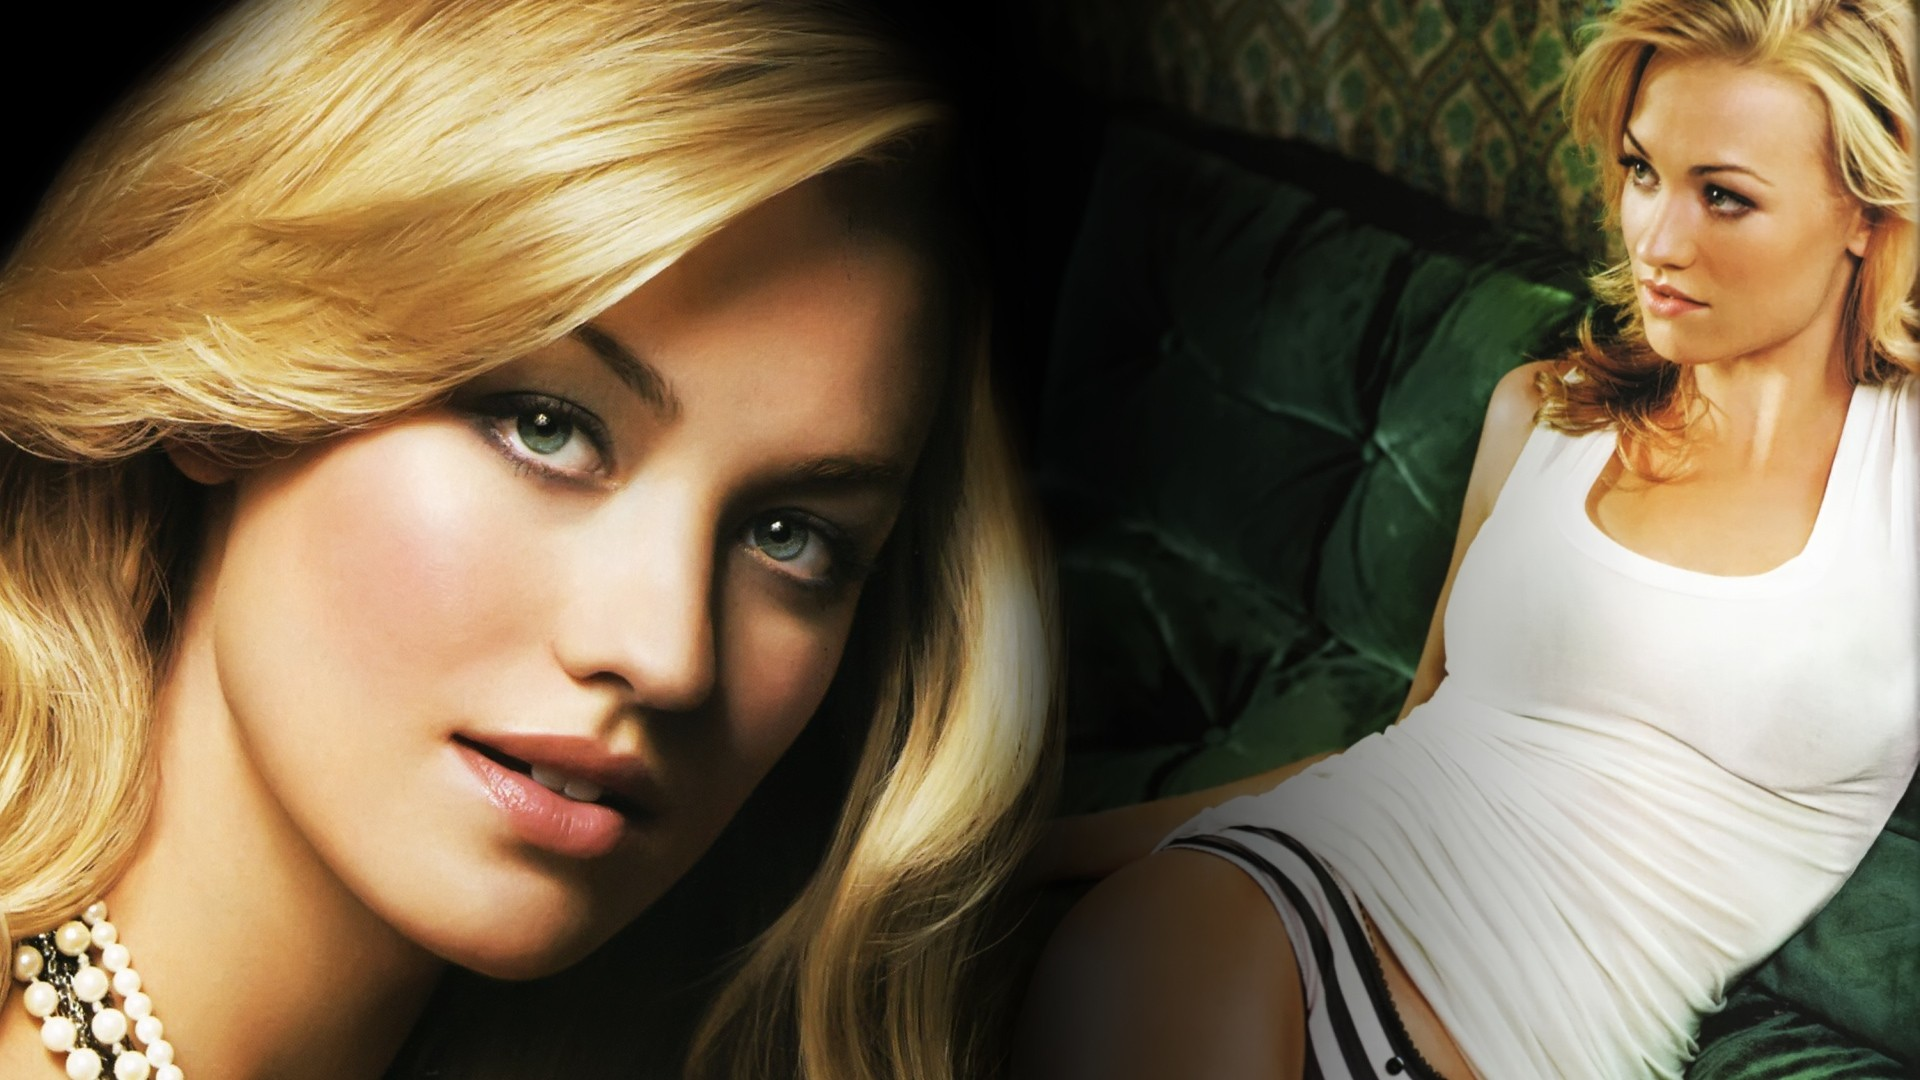 Celebrity - Yvonne Strahovski  - Yvonne Strahovski  Wallpaper